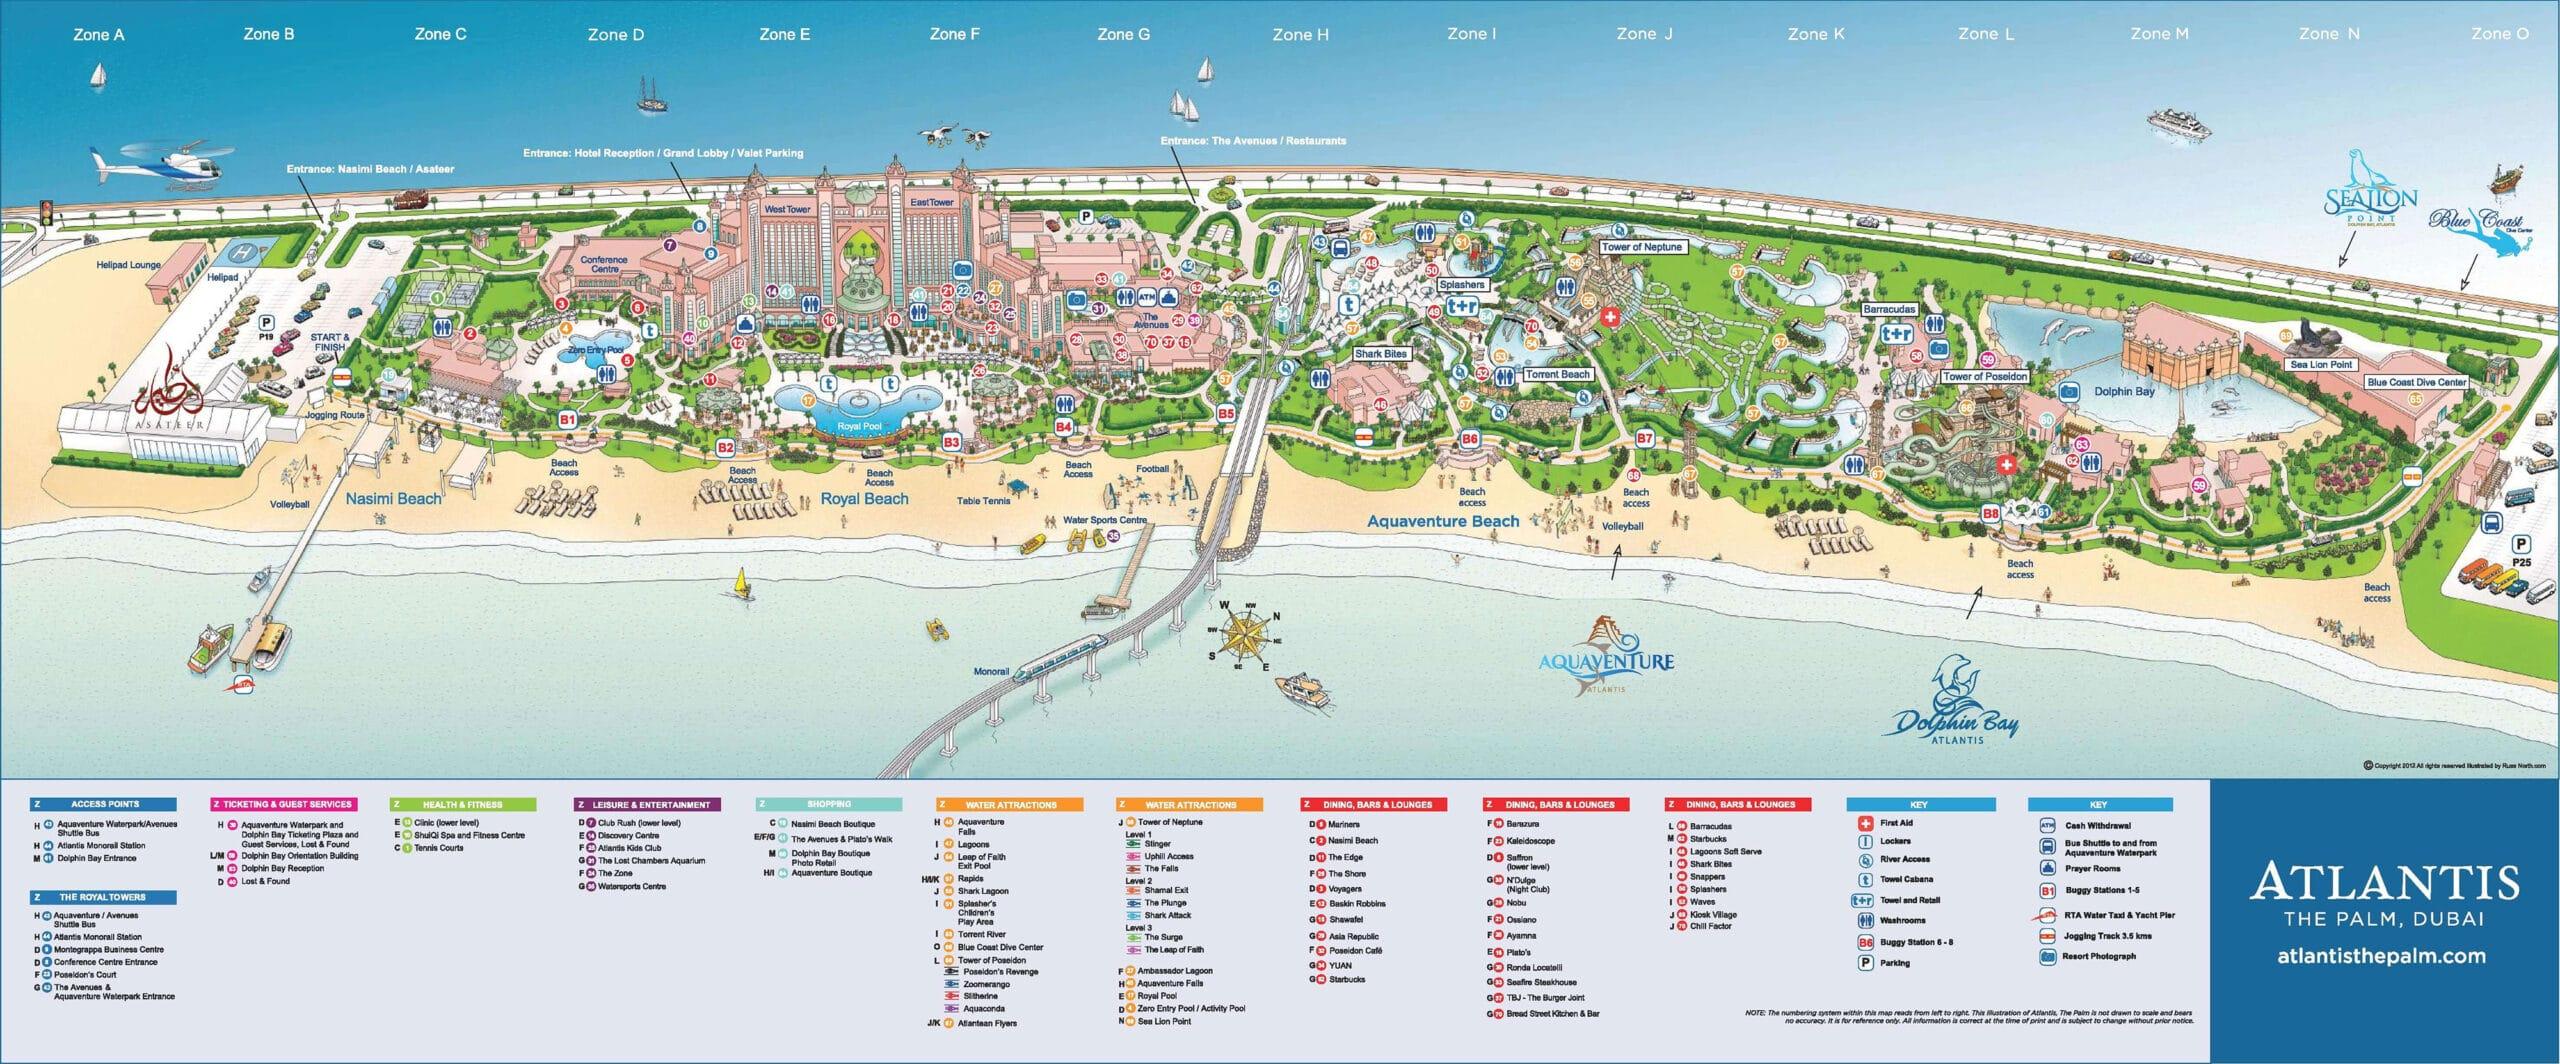 Atlantis the Palm Dubai Map